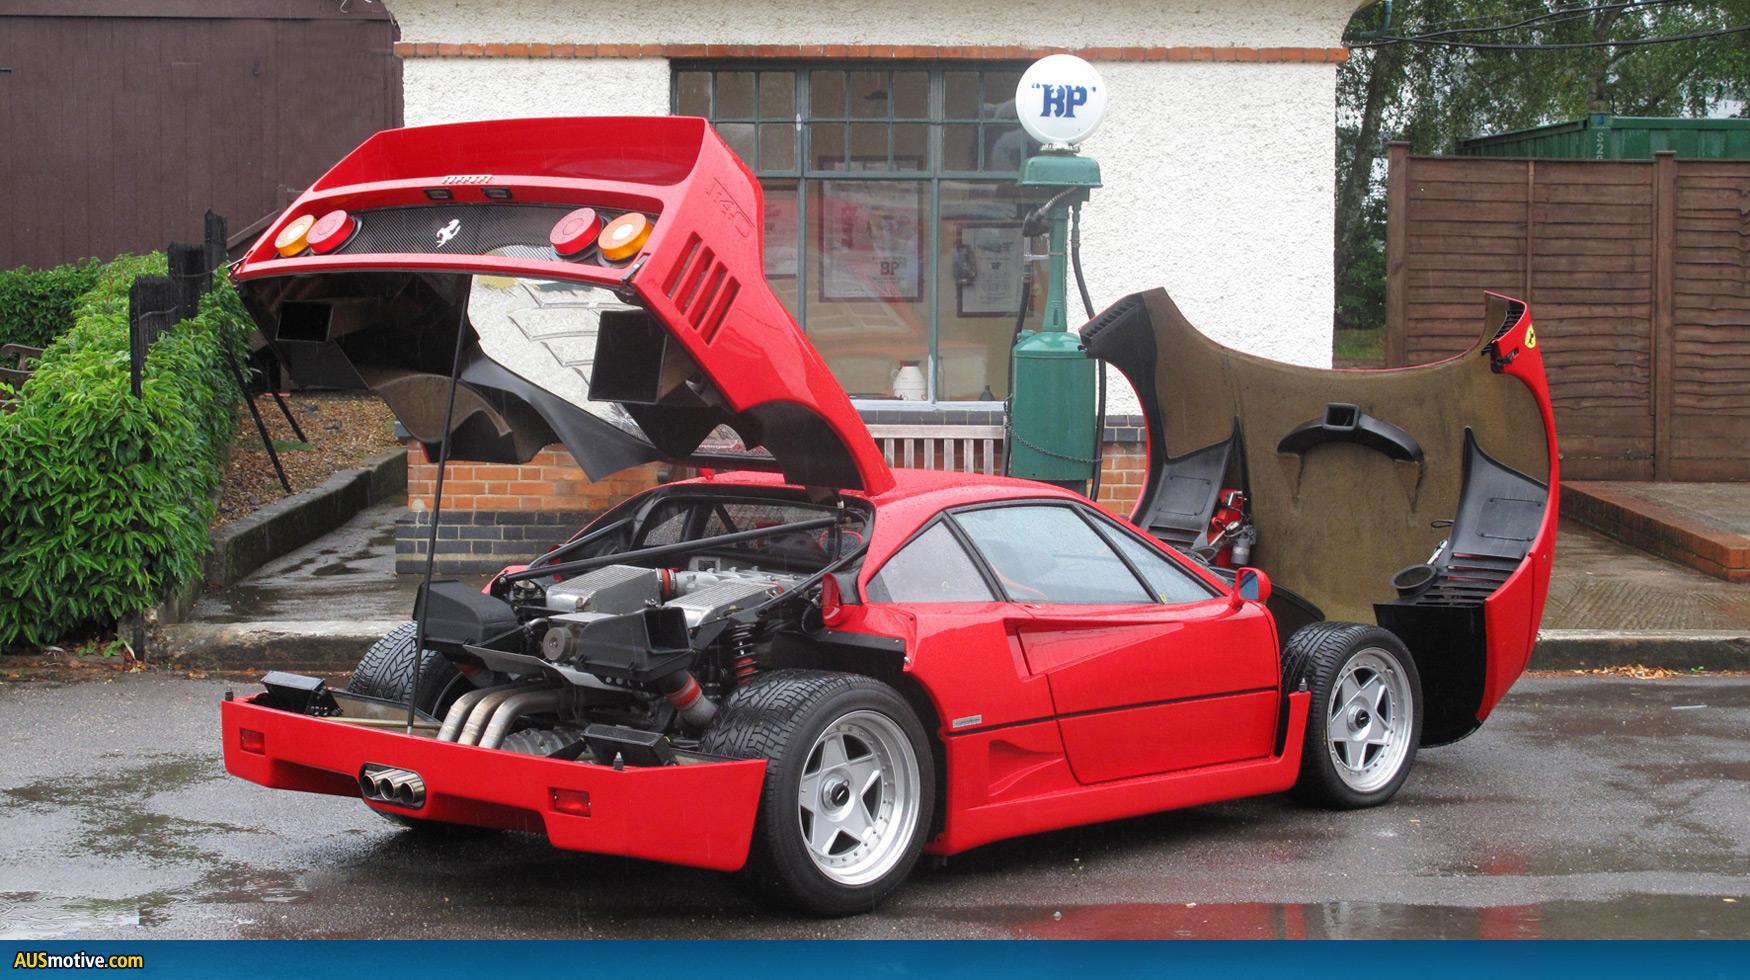 Ferrari F40 Kit Car For Sale images